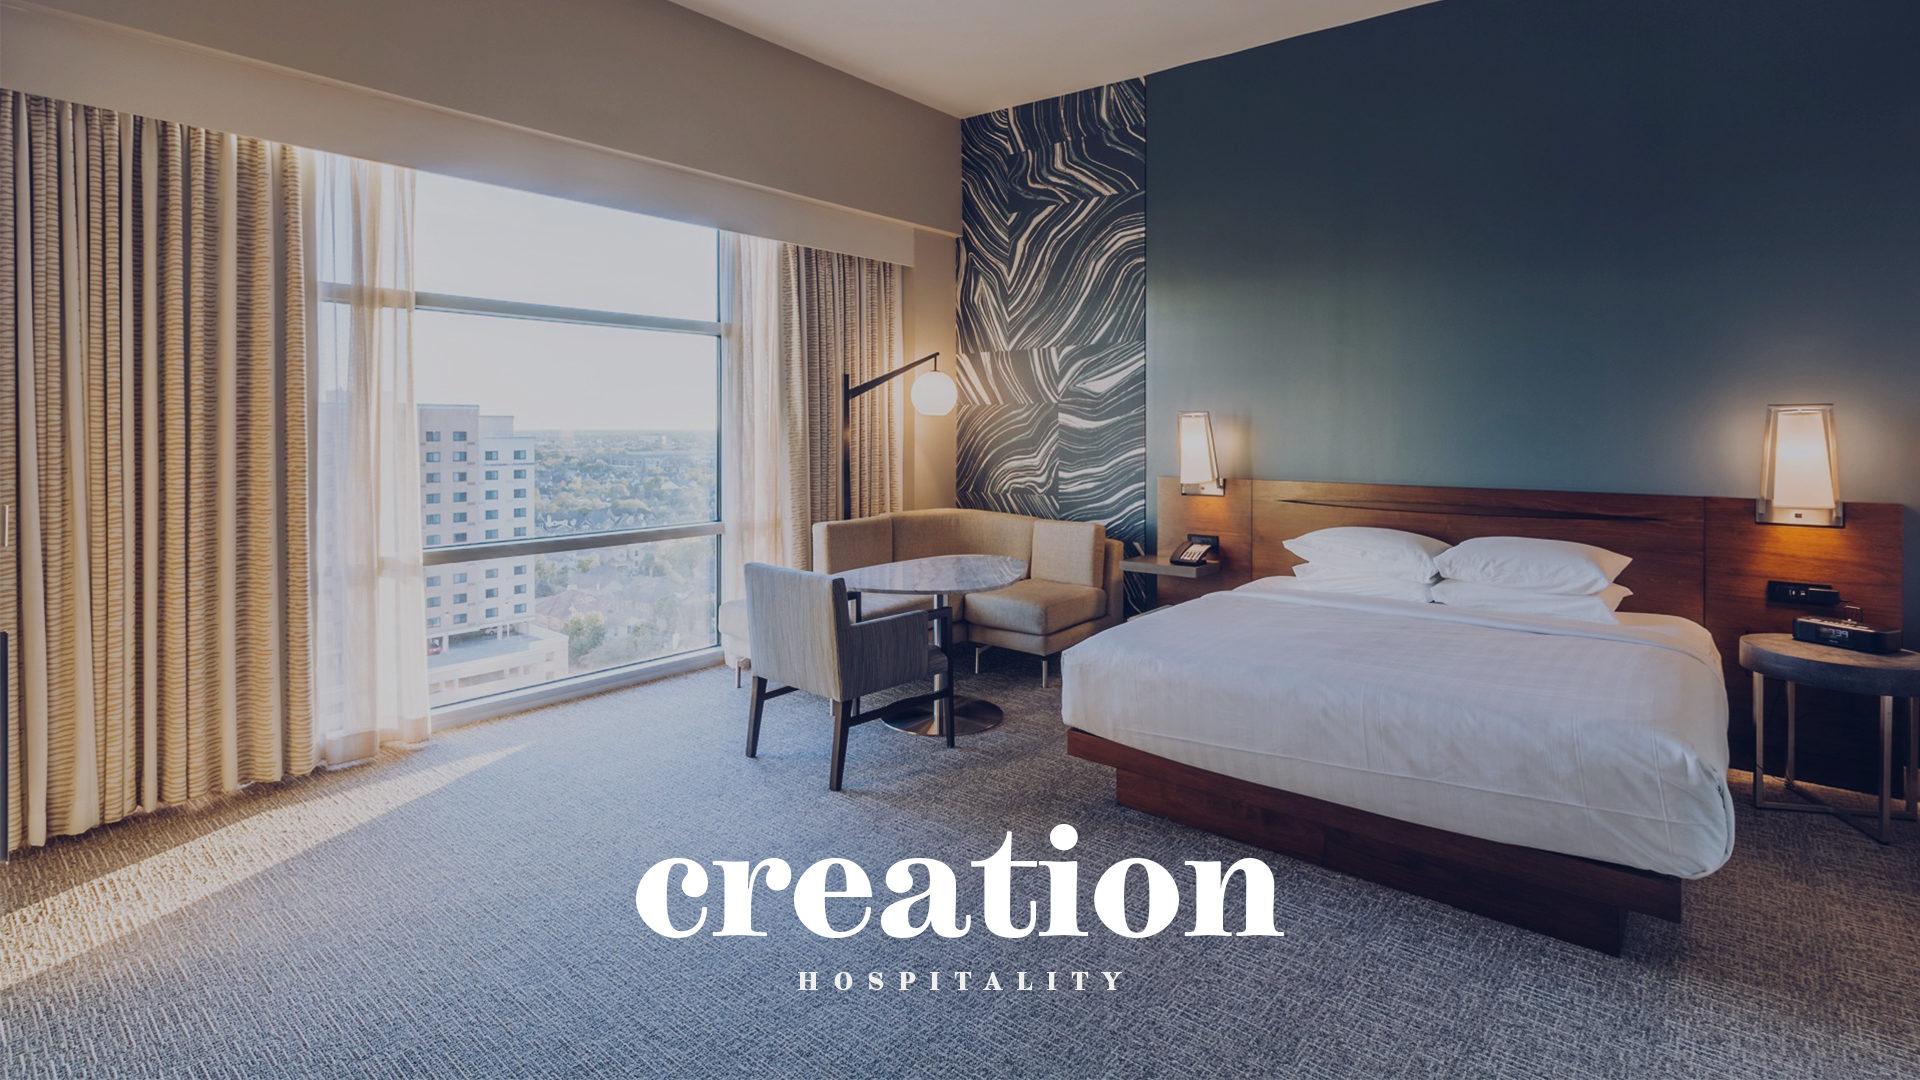 Creation Hospitality